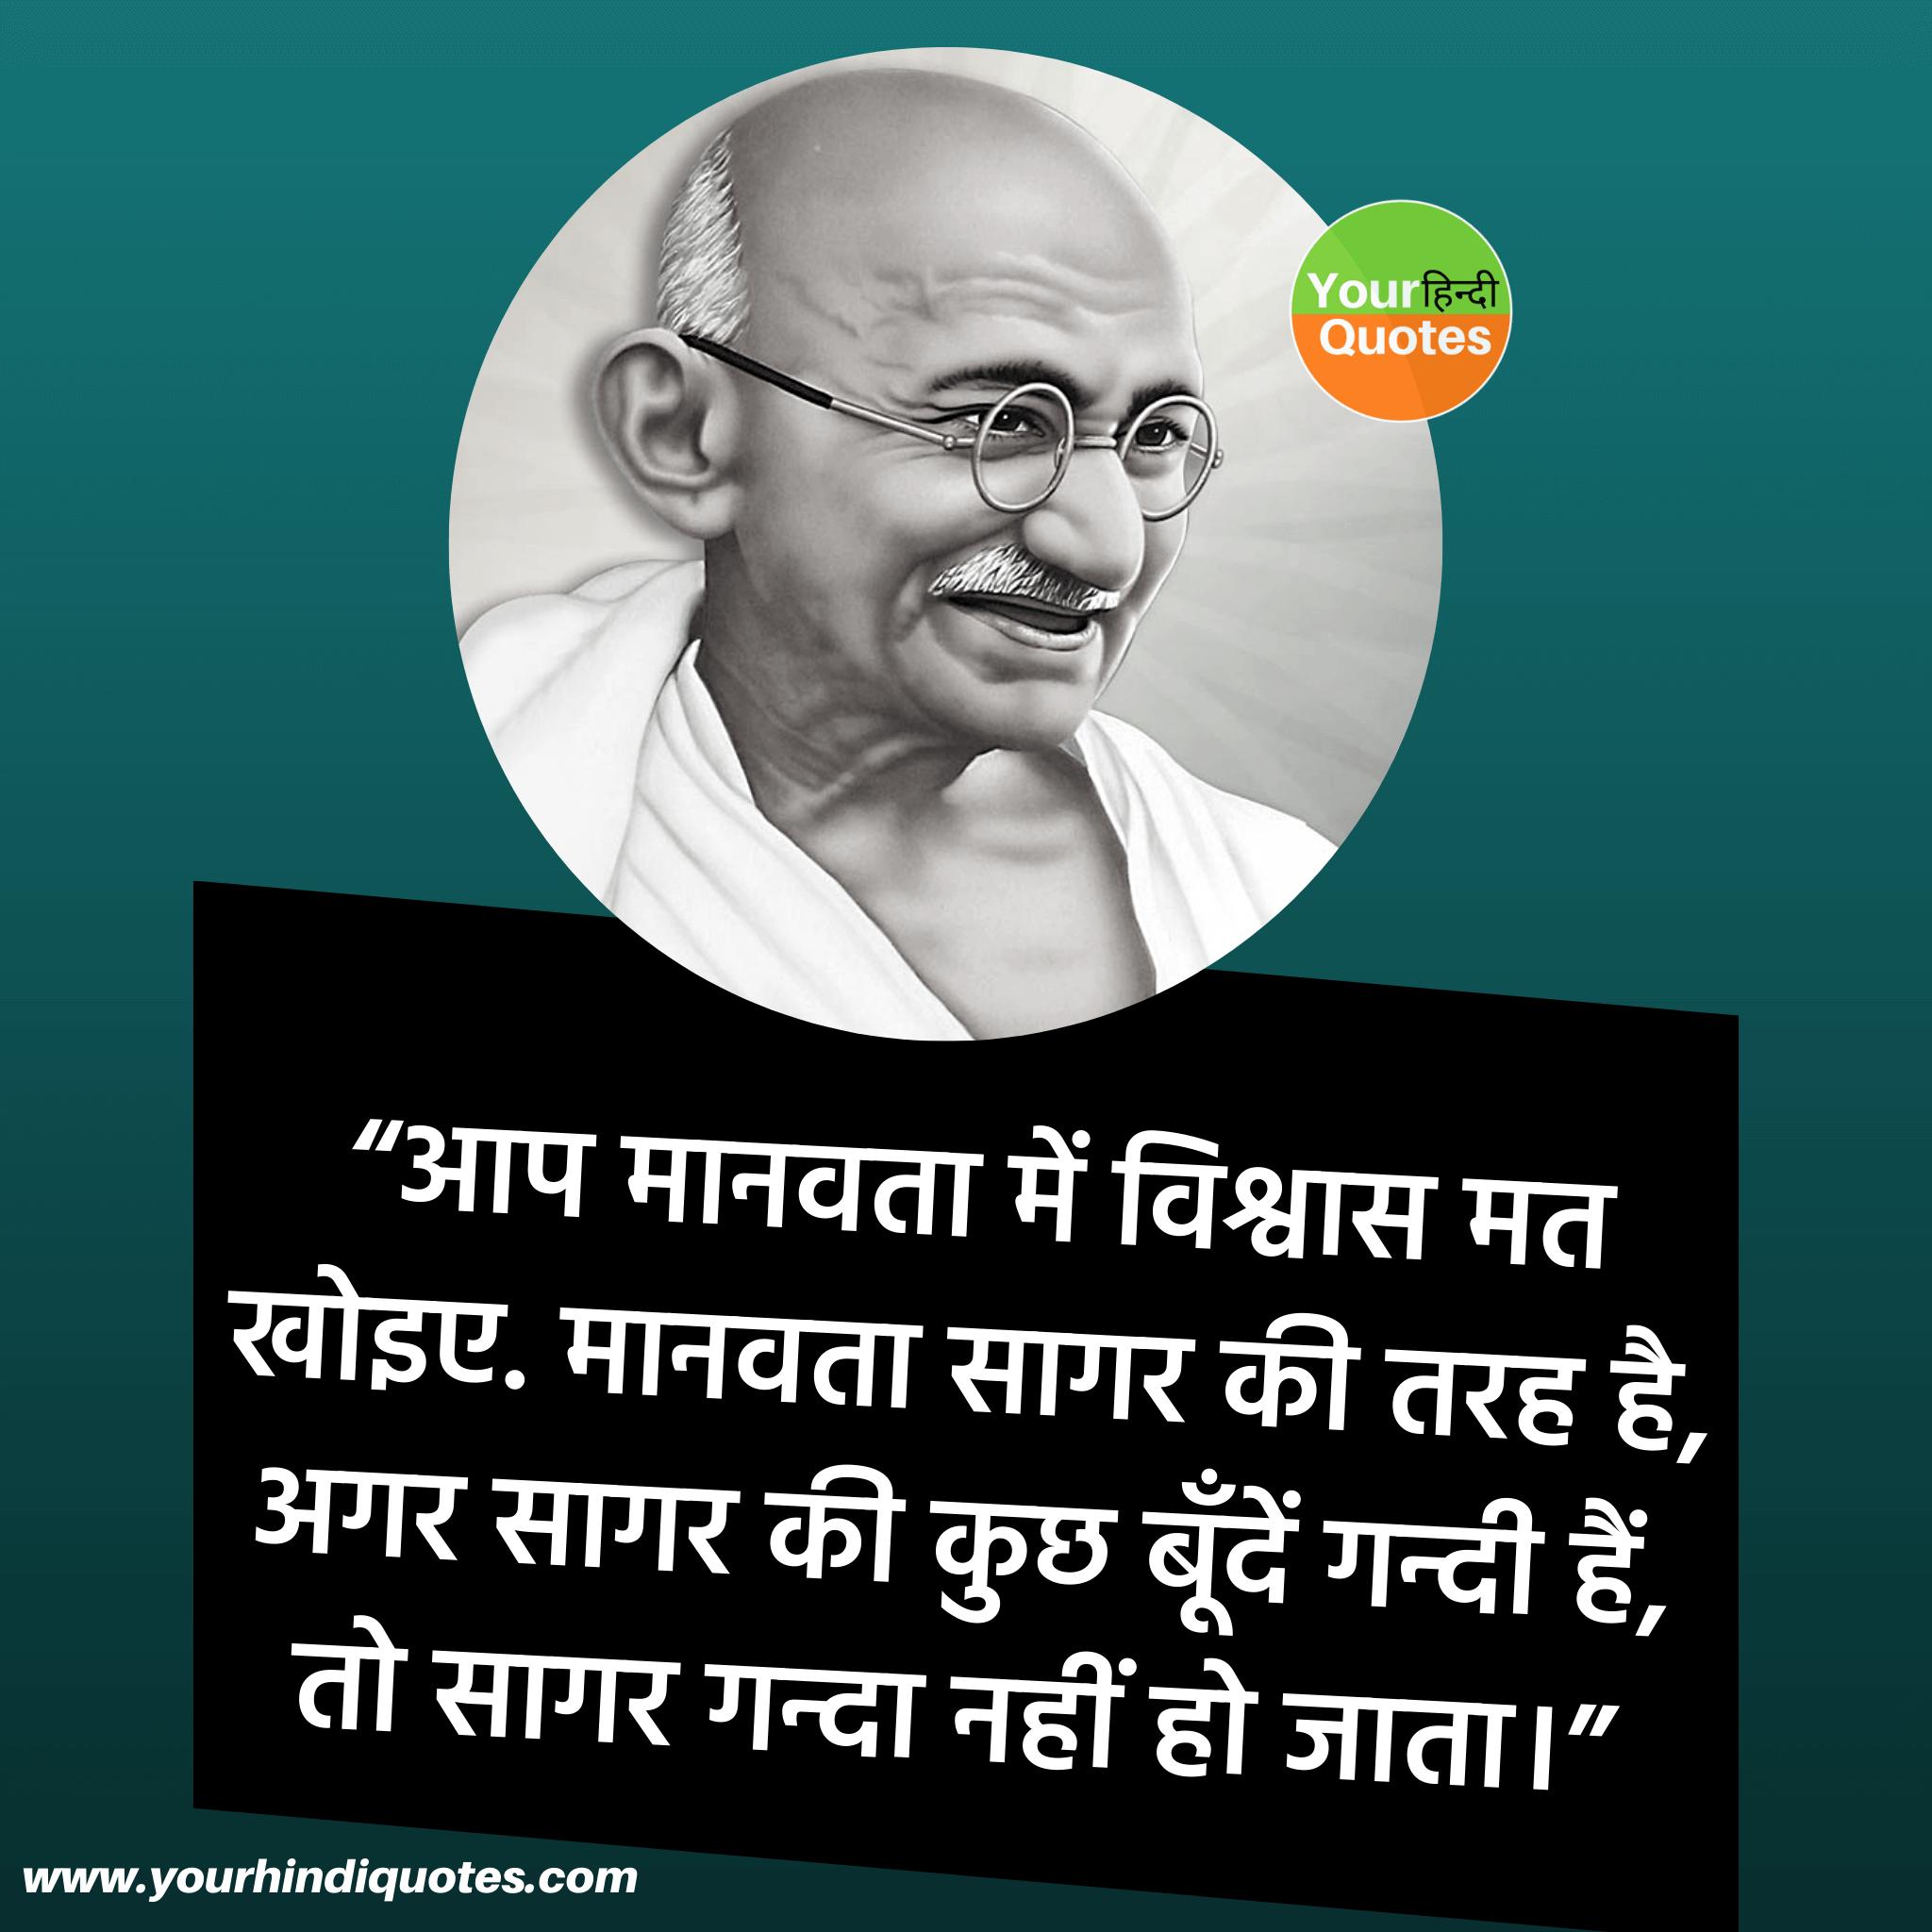 Mahatma Gandhi Hindi Quotes Image